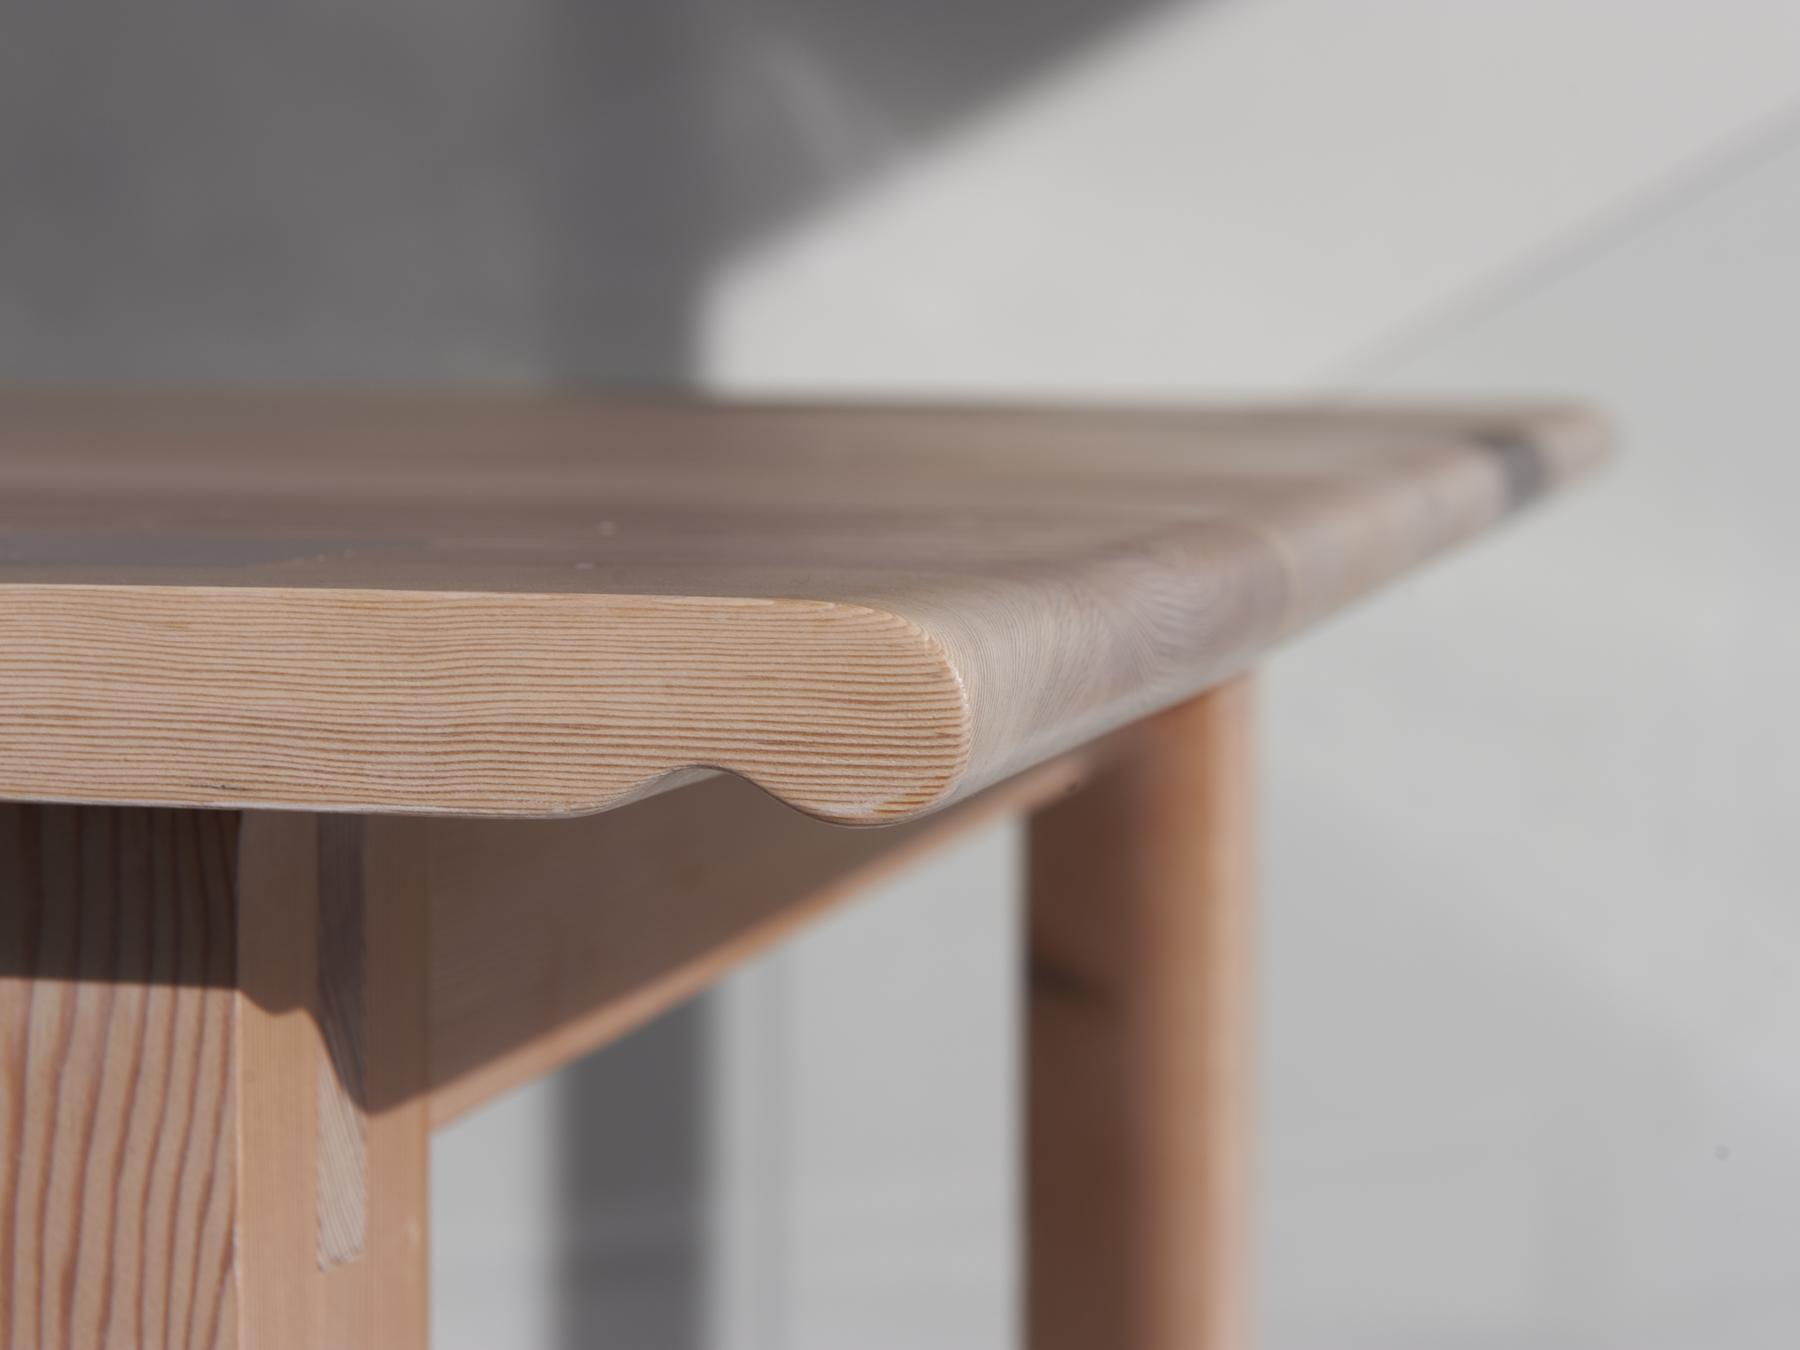 table barrow handle detail.jpg